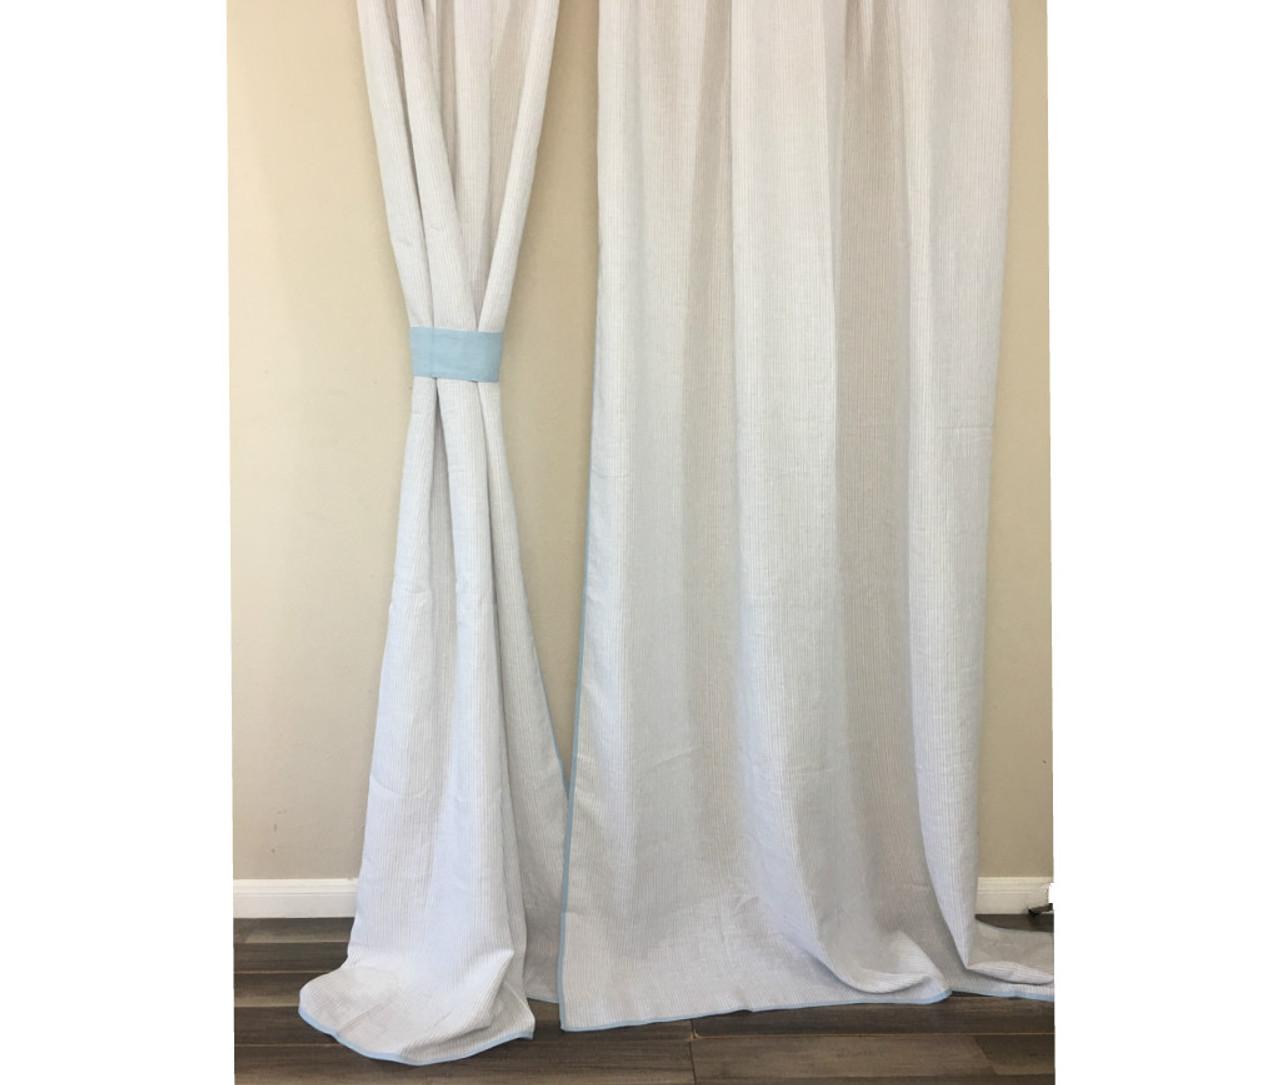 Light Grey Ticking Striped Curtain With Blue Trim